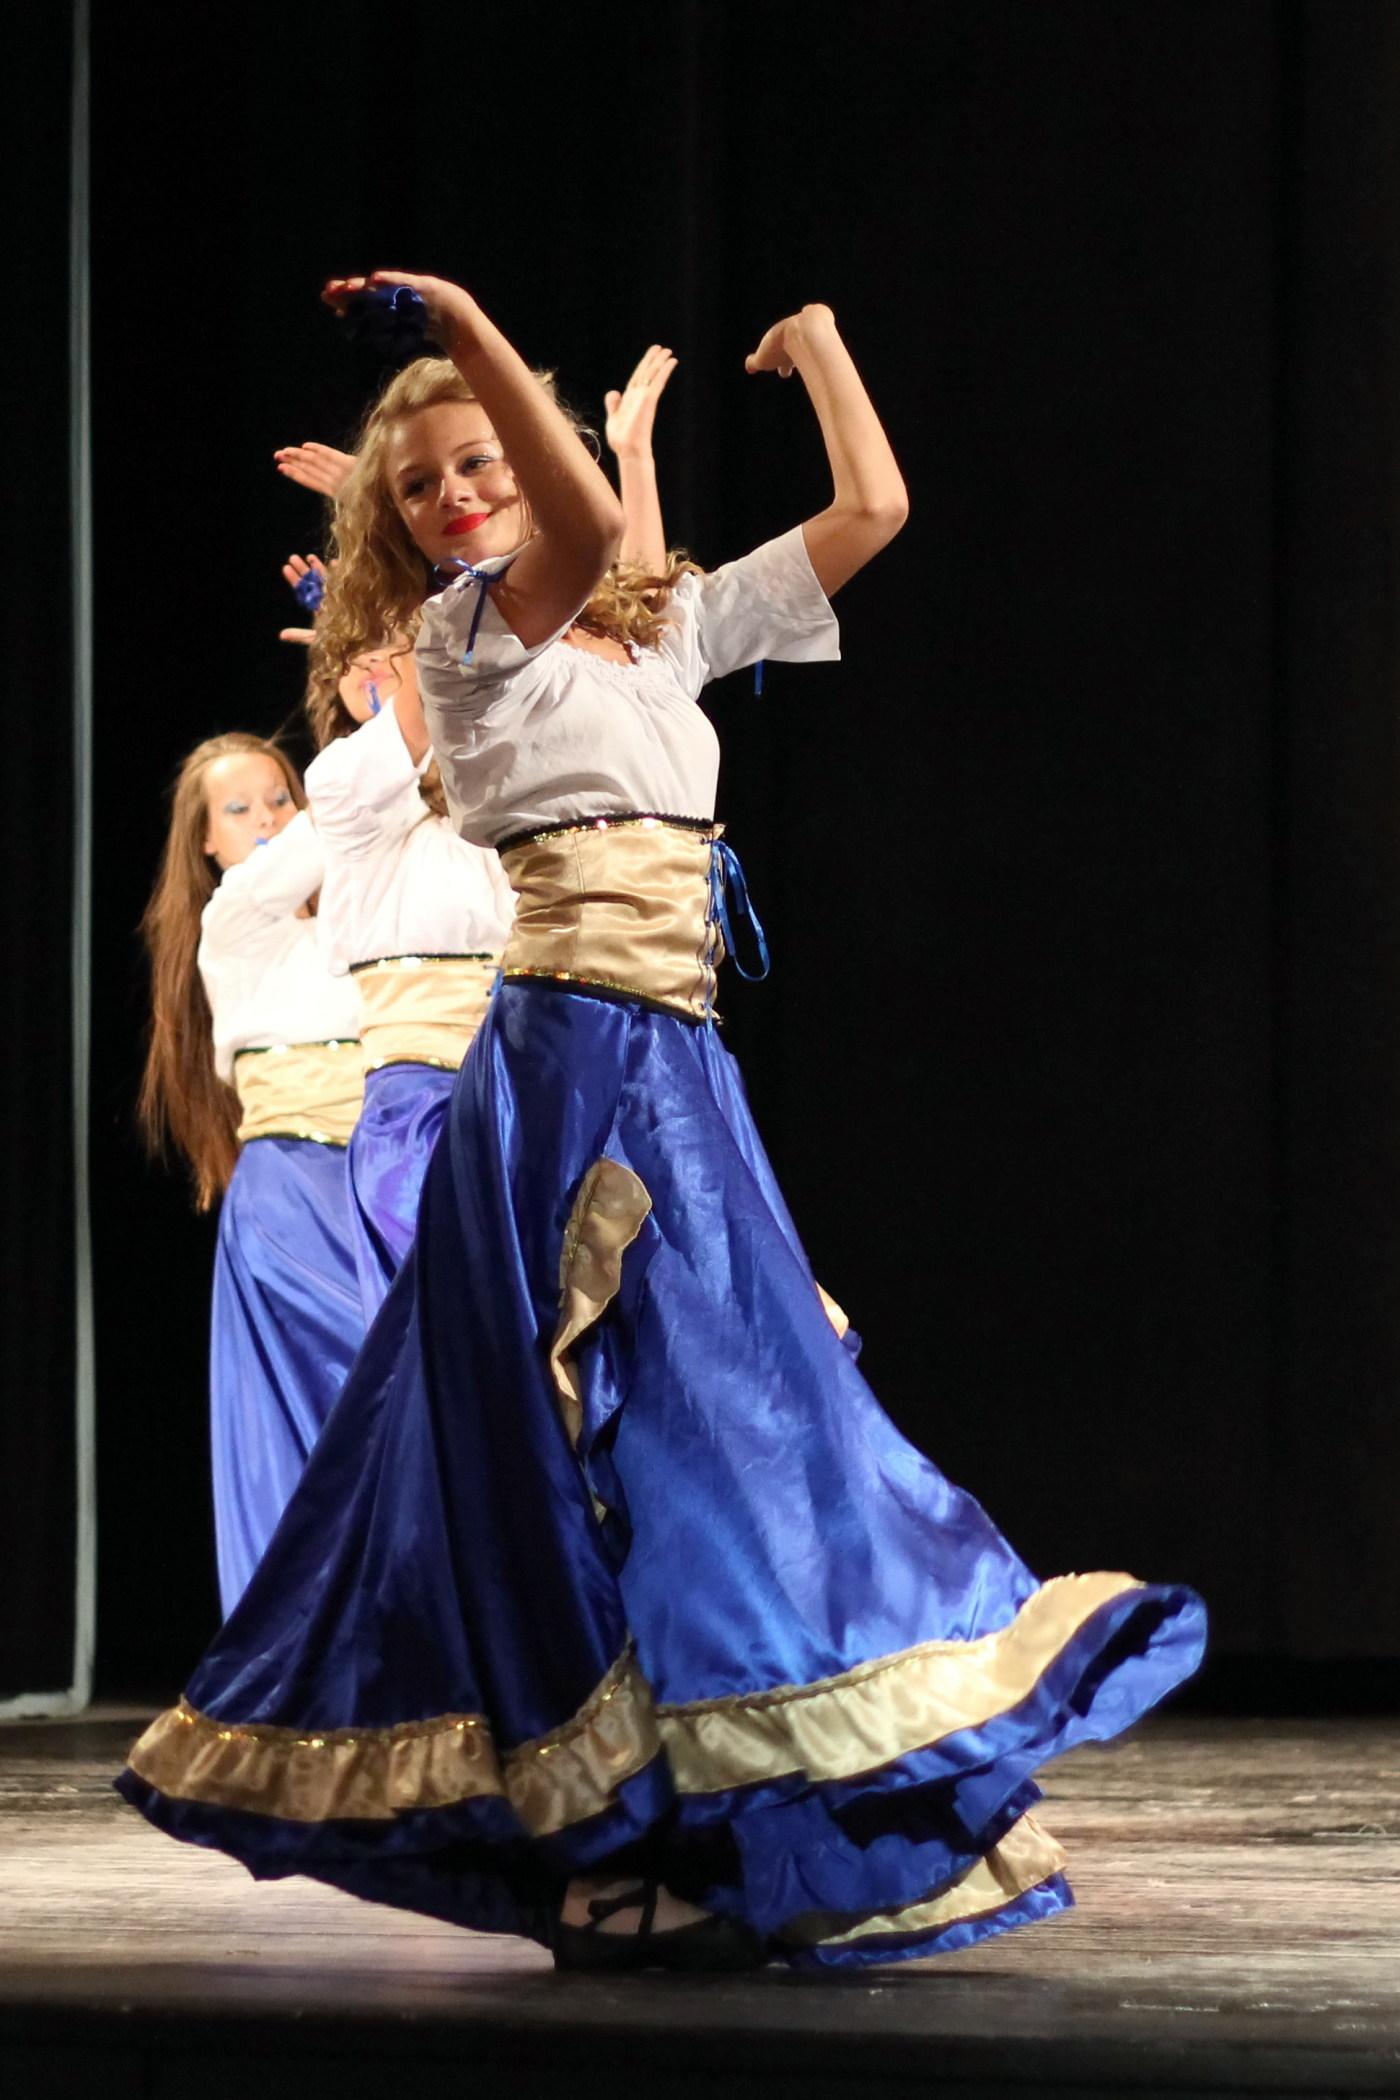 zvolenske-tanecne-podium-35